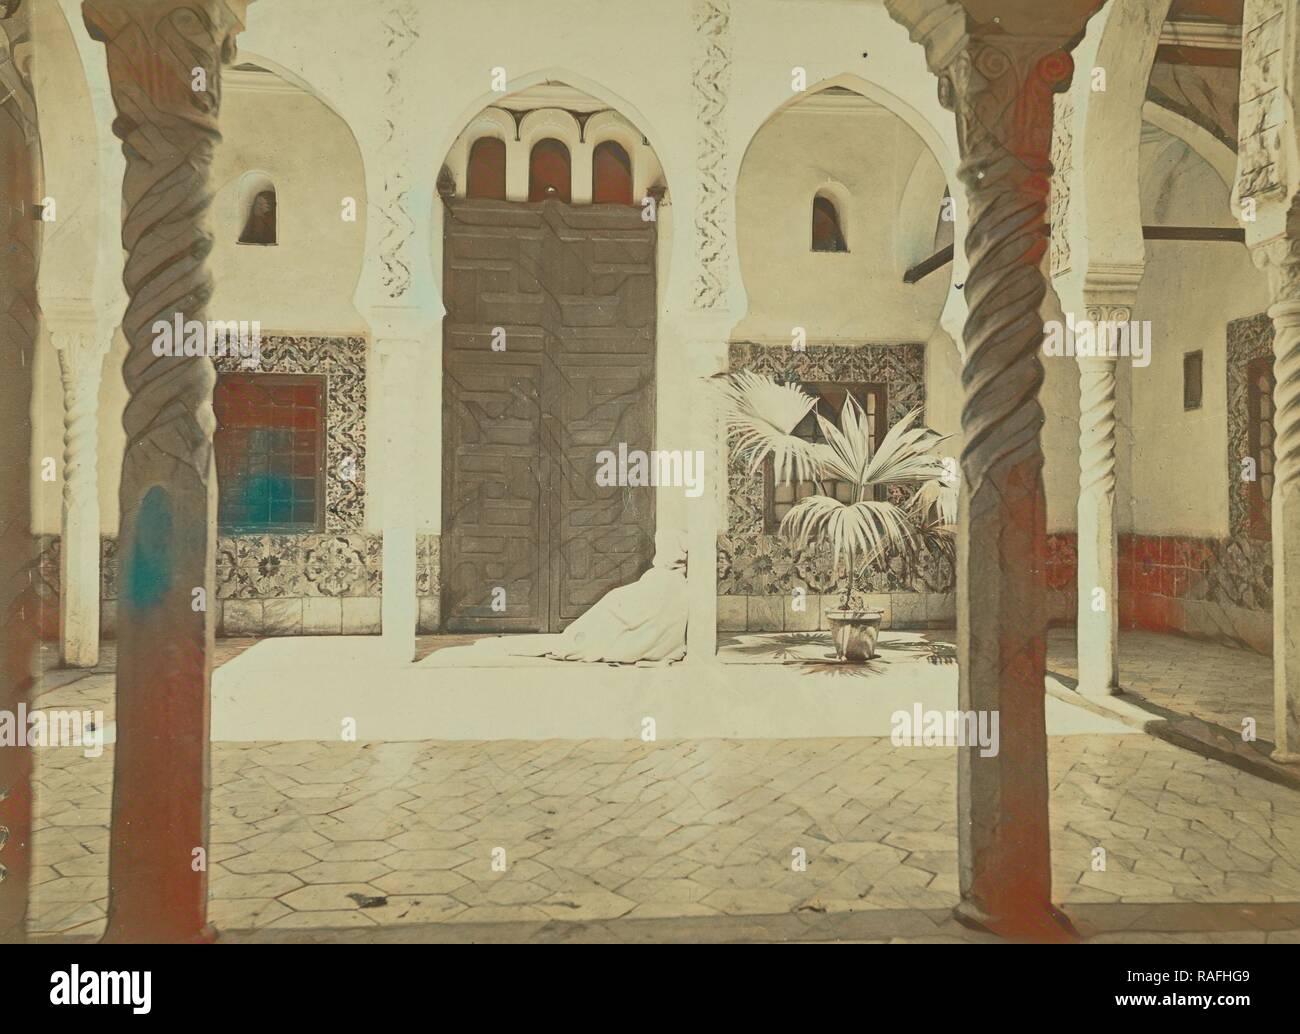 Intérieur Mauresque, Alger, egipcio, Argel, Argelia, alrededor de 1865-1875, albúmina imprimir plata. Reinventado Foto de stock